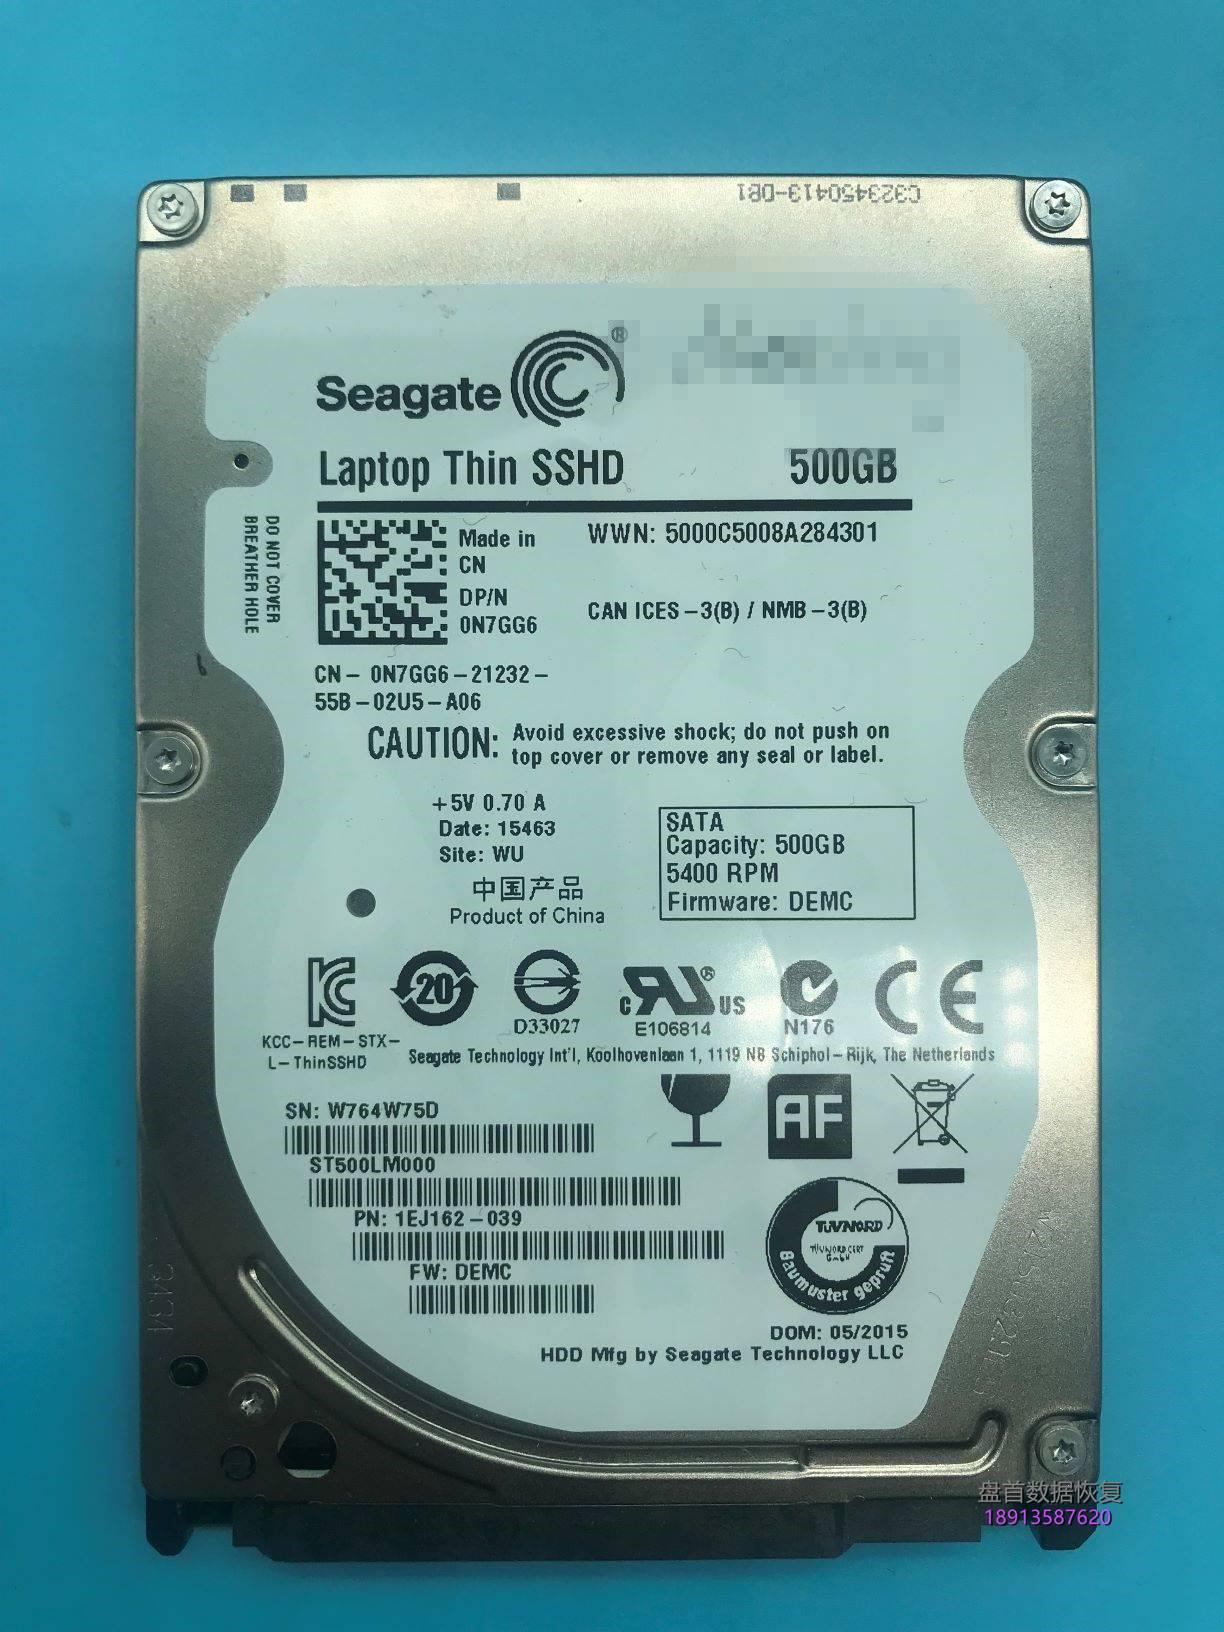 0-6 ST500LM000希捷SSHD通电不转修复成功